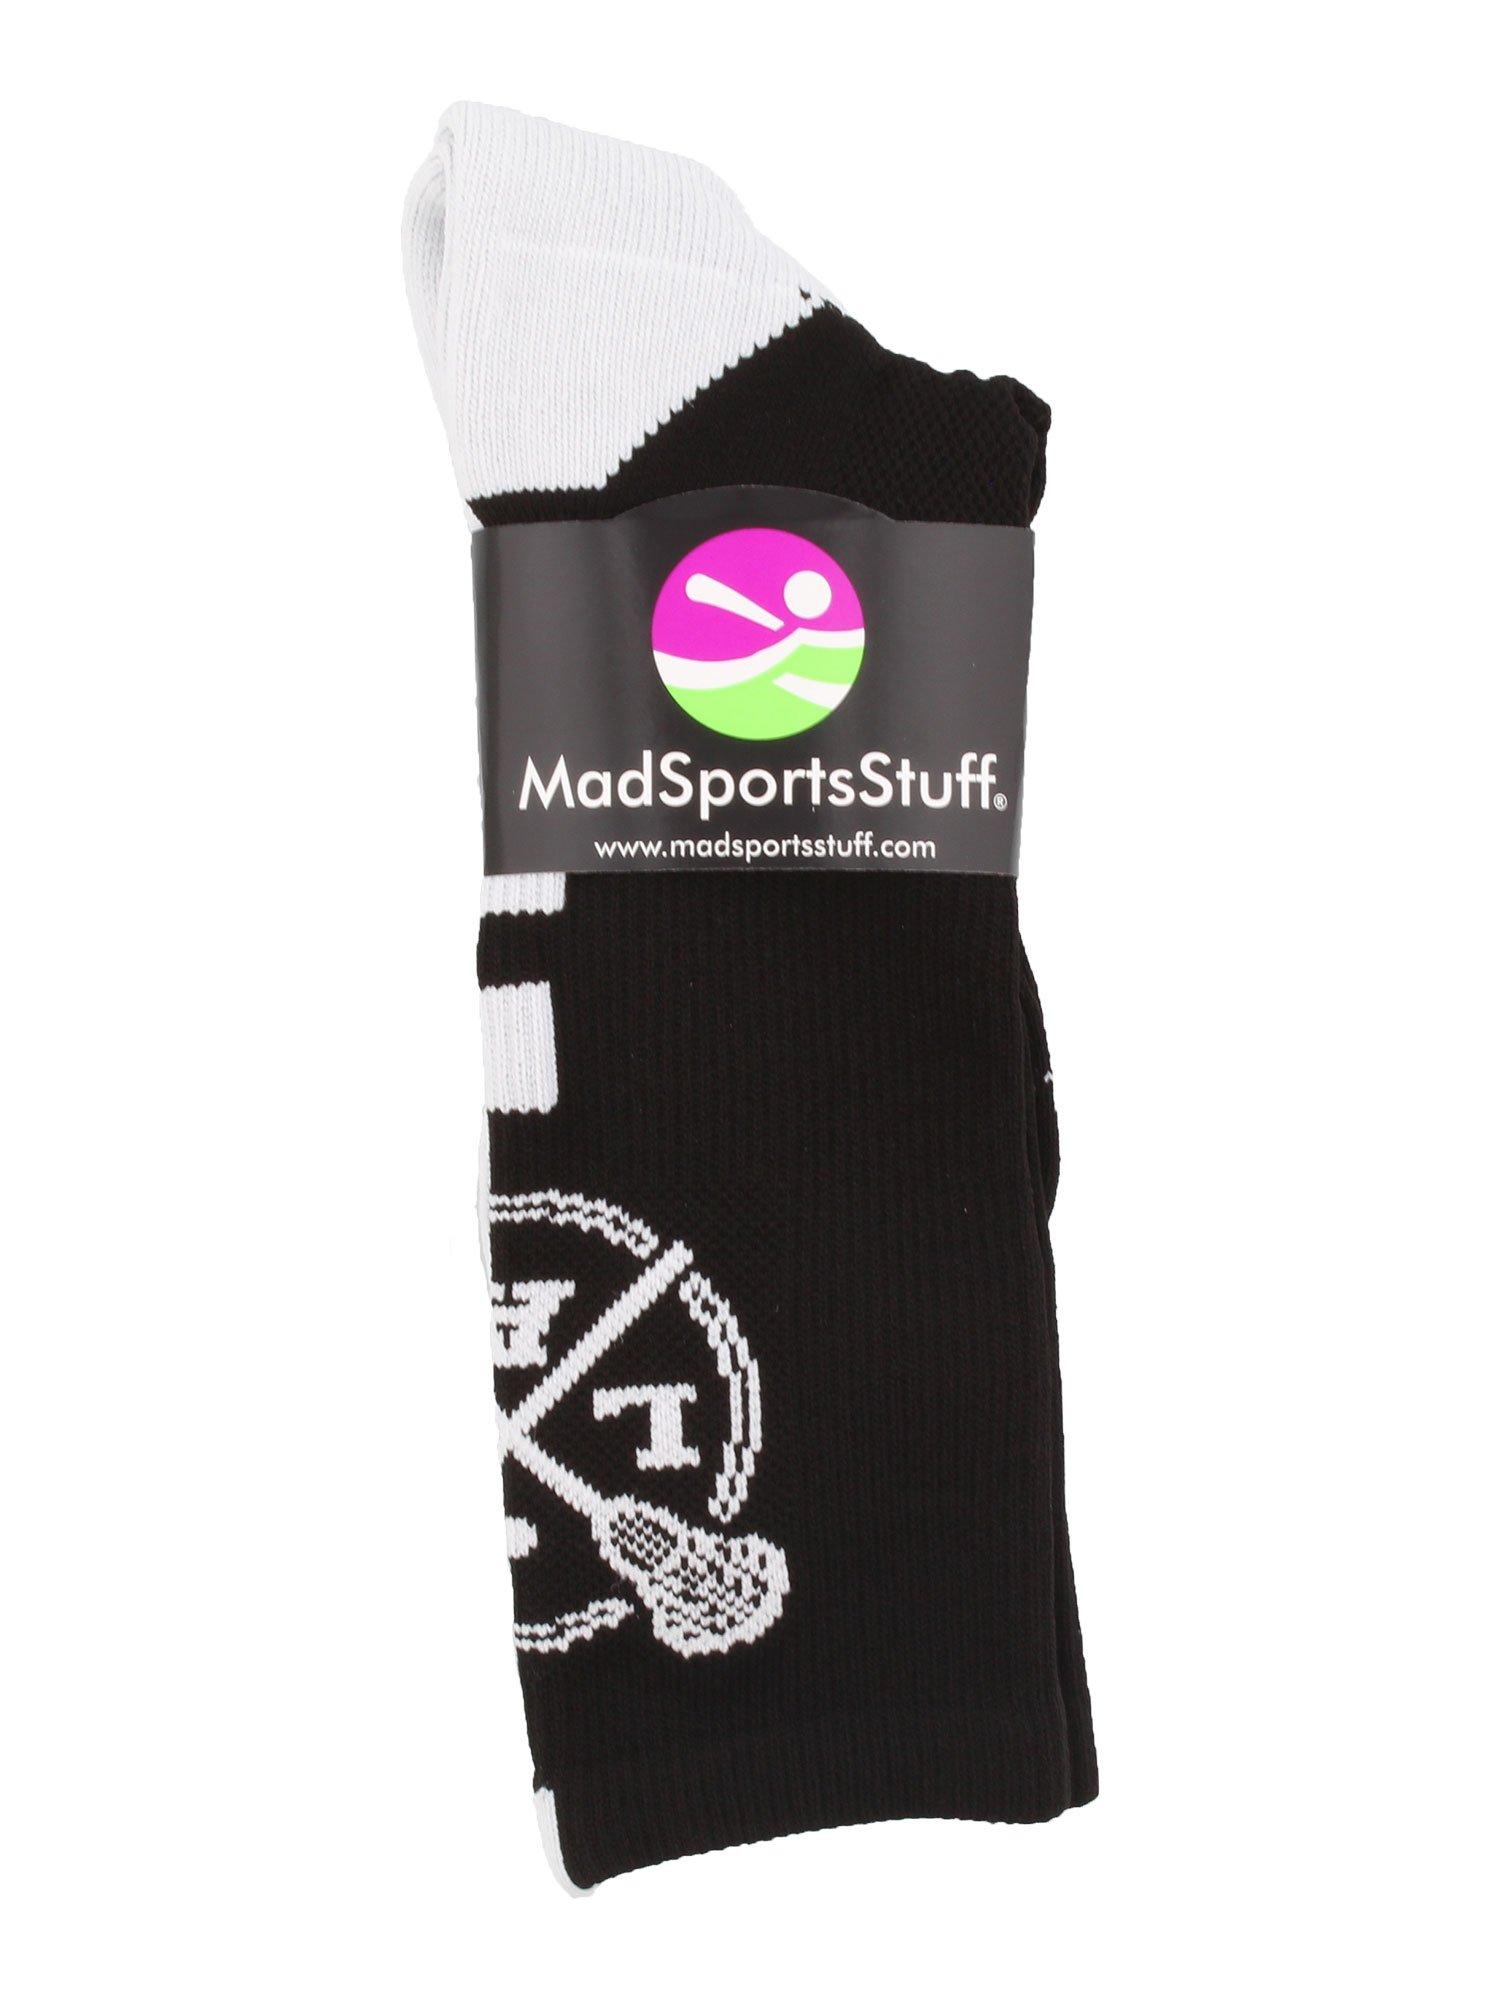 MadSportsStuff LAX Lacrosse Socks Lacrosse Sticks Athletic Crew Socks (Black/White, Large) by MadSportsStuff (Image #2)